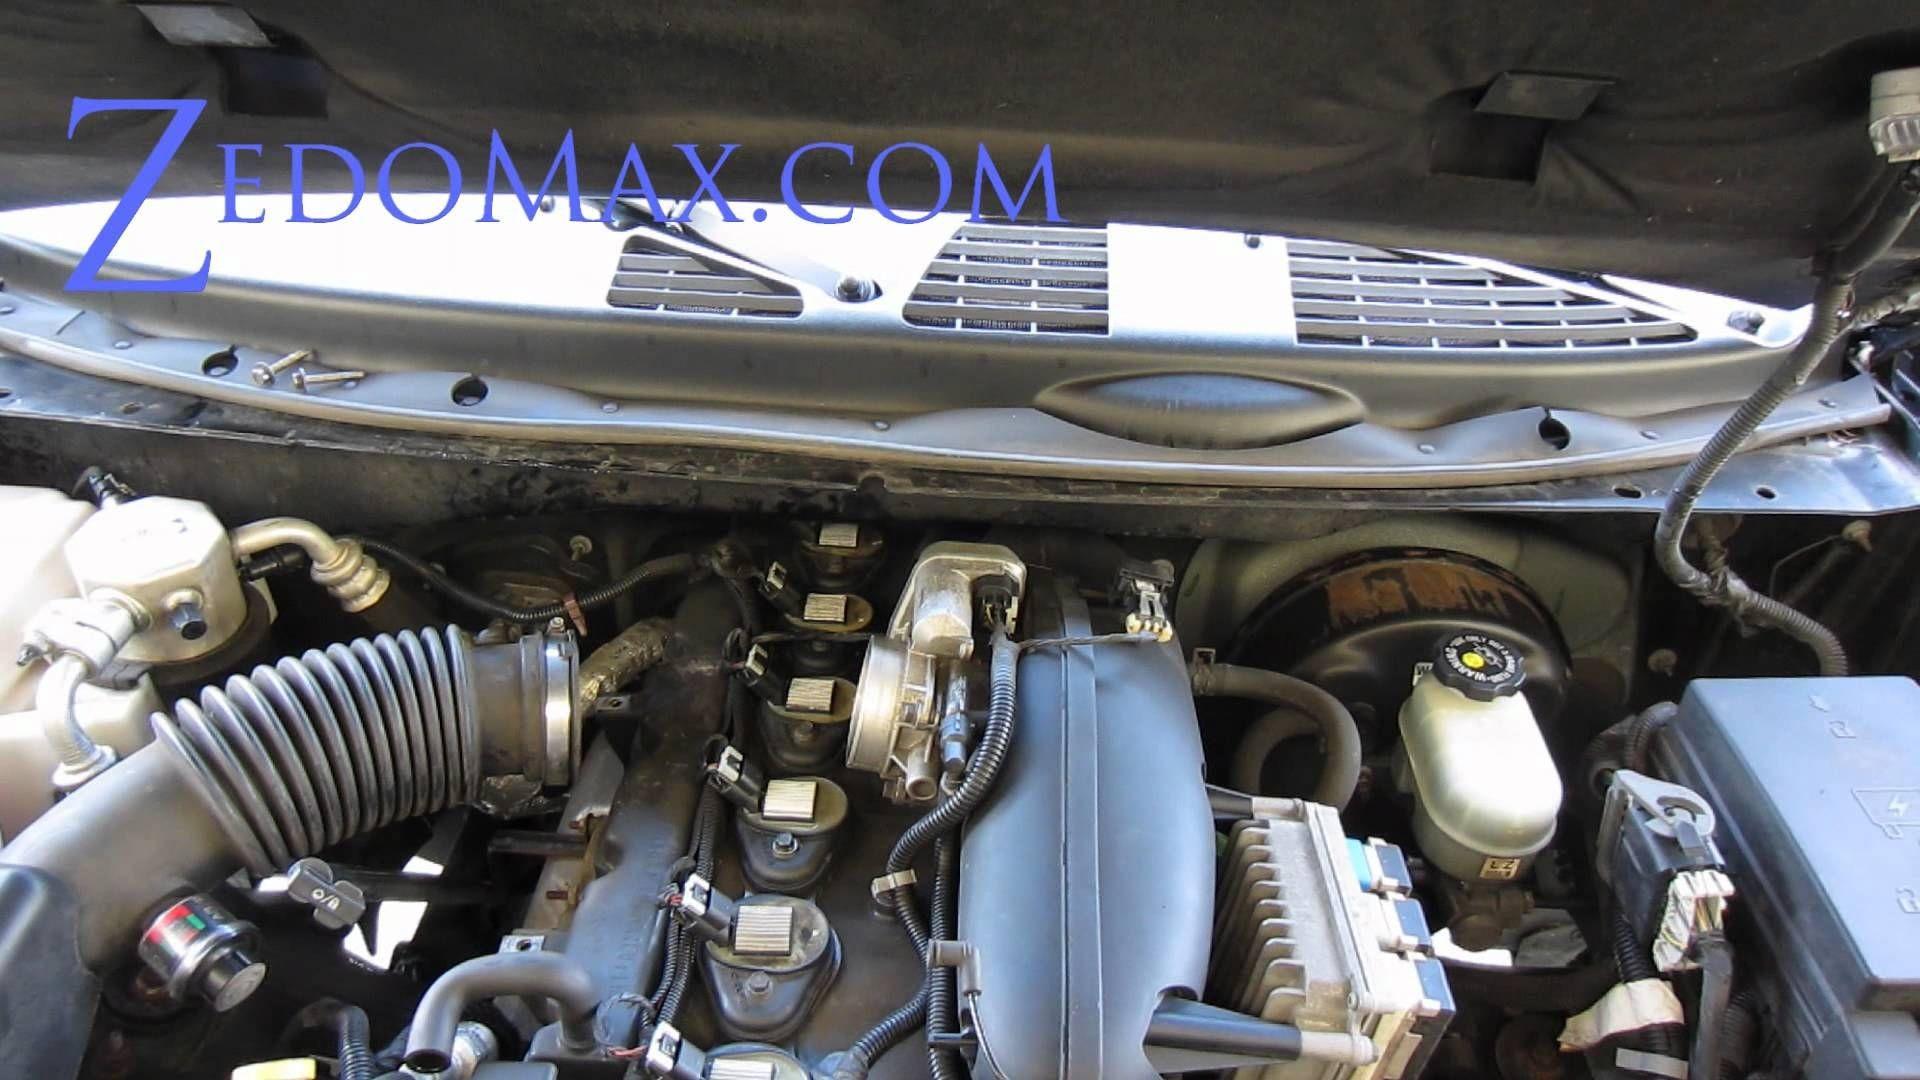 2003 Chevy Trailblazer Engine Diagram How to Replace Ignition Coil Spark Plugs On Chevy Trailblazer Of 2003 Chevy Trailblazer Engine Diagram